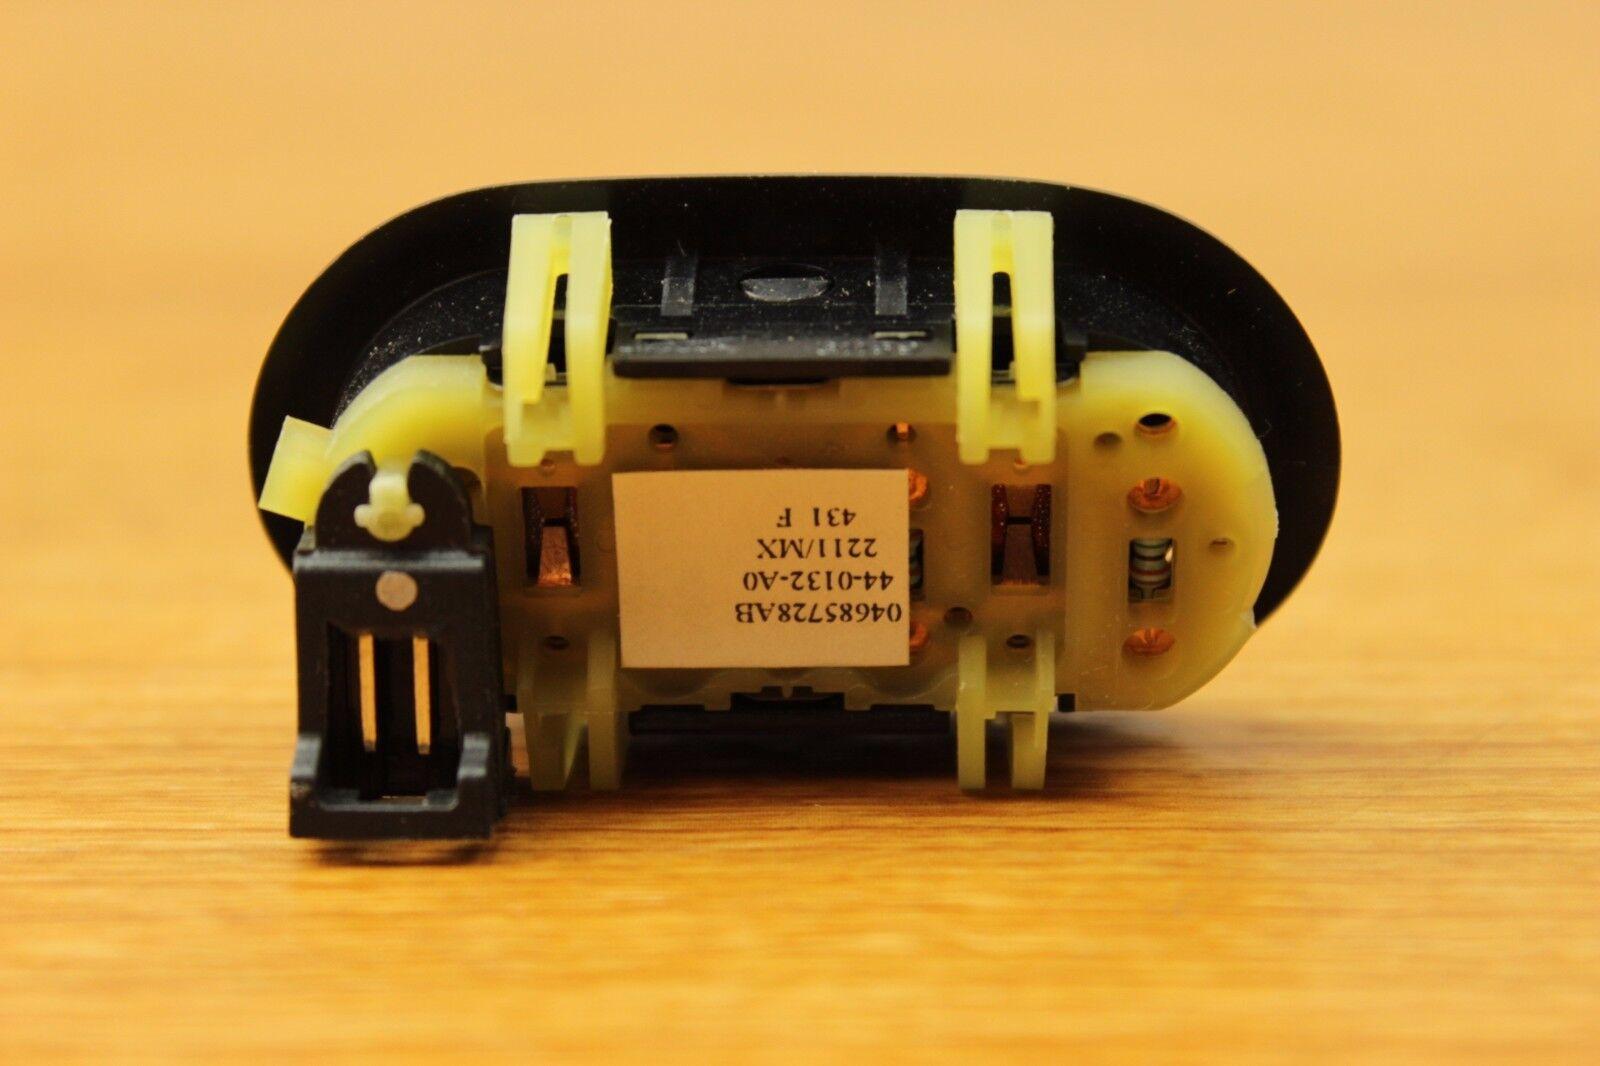 01 15 Chrysler Jeep Dodge Ram Right Side Radio Control Steering 2001 Grand Cherokee Stereo Wiring Wheel Switch Oem